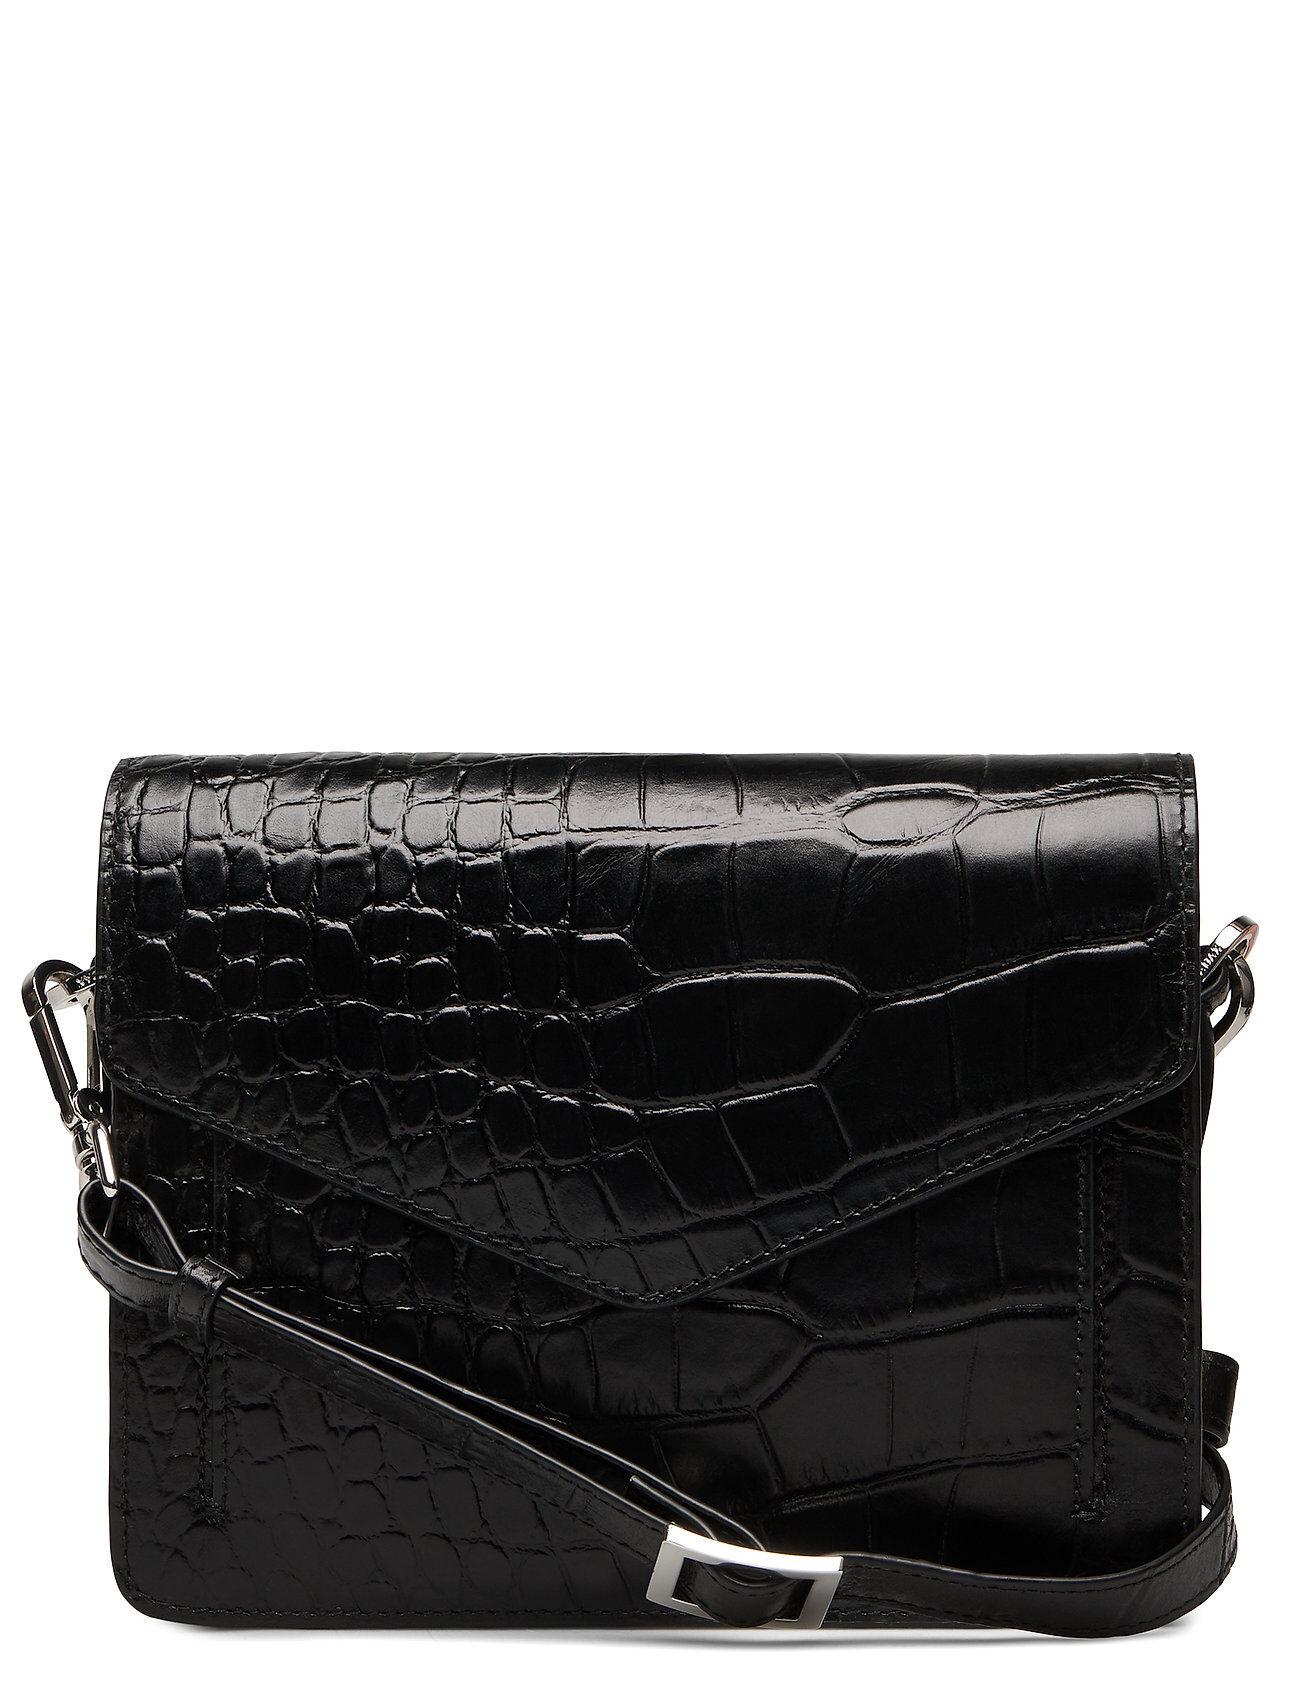 Adax Teramo Shoulder Bag Pearl Bags Small Shoulder Bags - Crossbody Bags Musta Adax